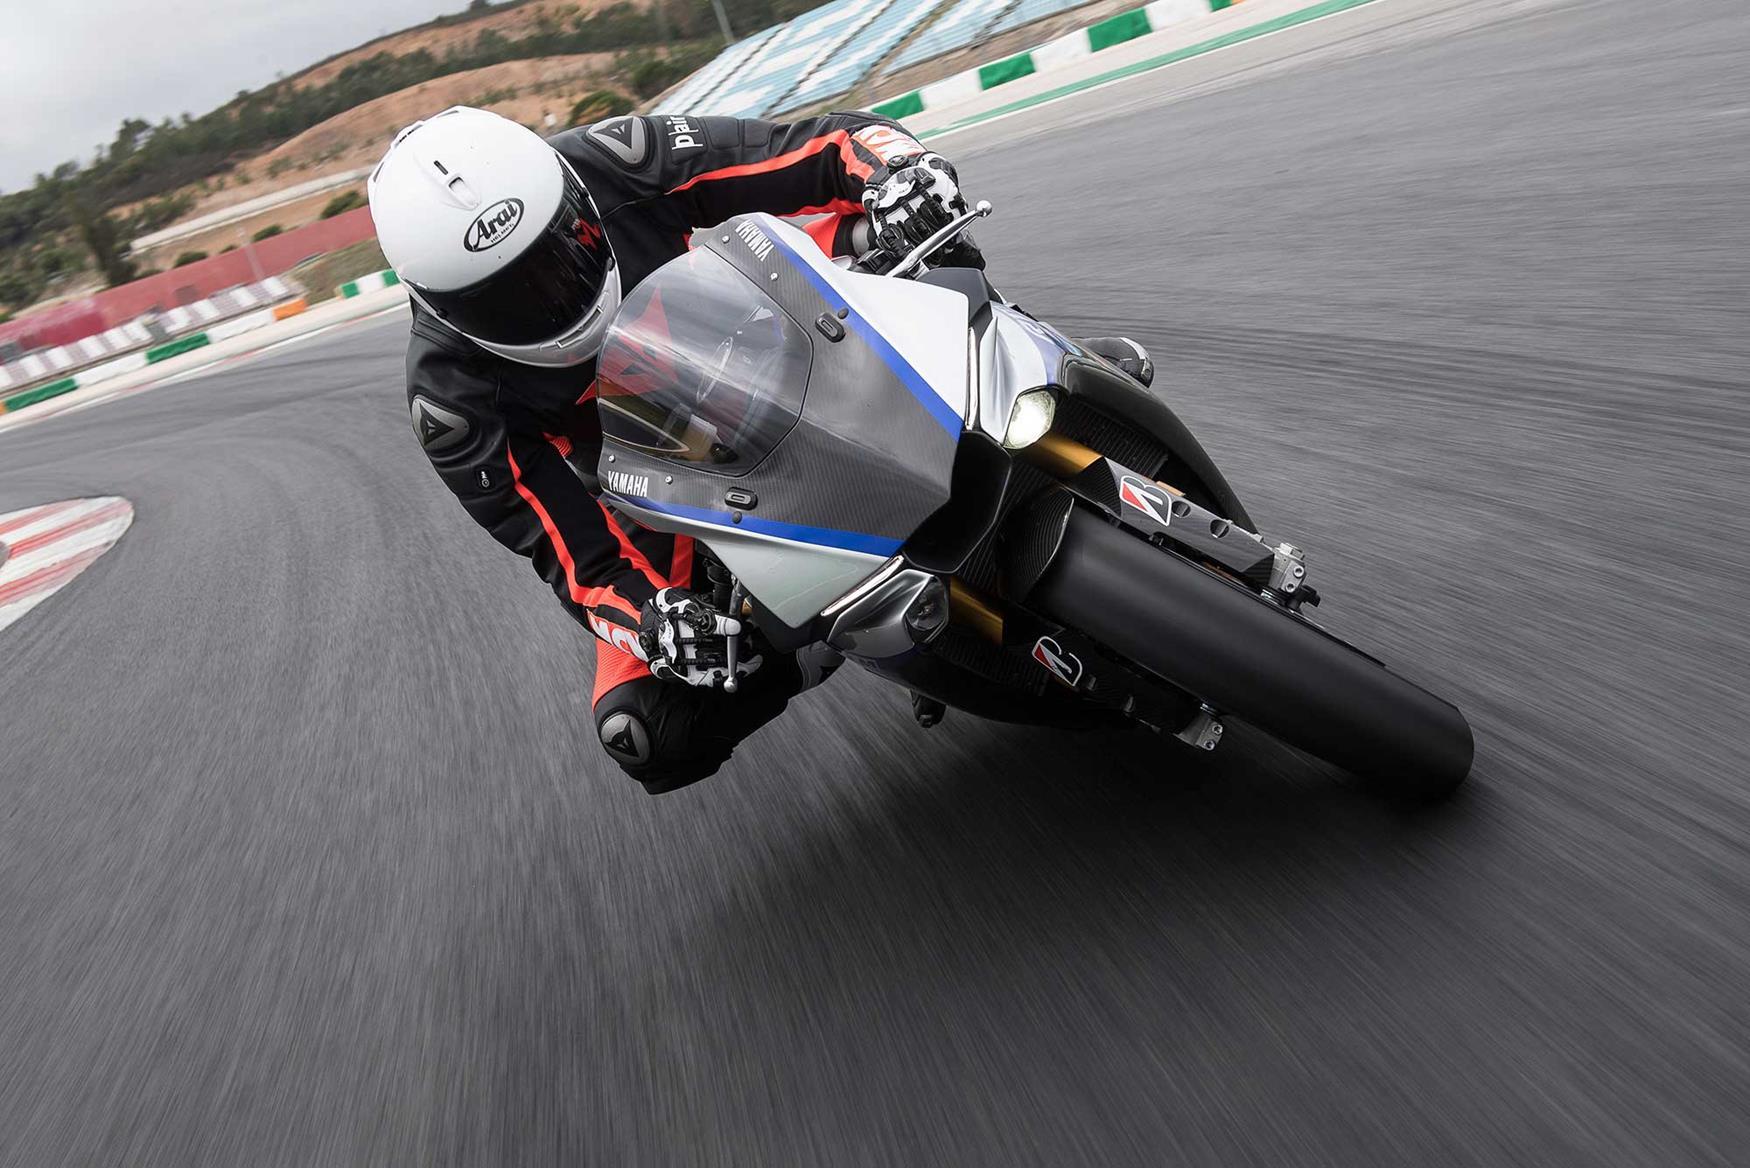 Yamaha R1M cornering